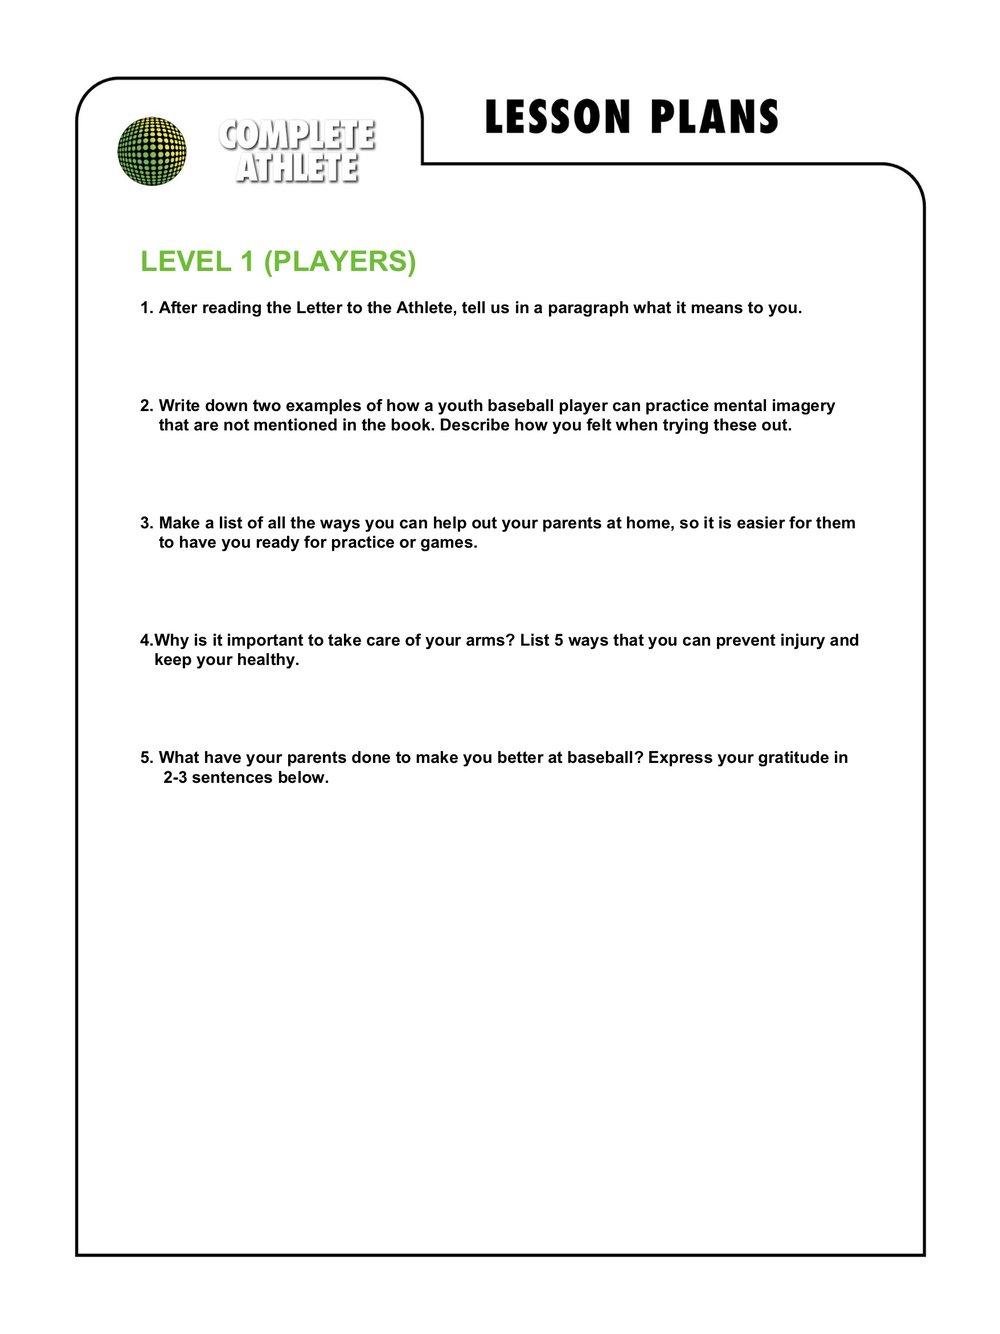 Lesson Plan Level 1.jpg